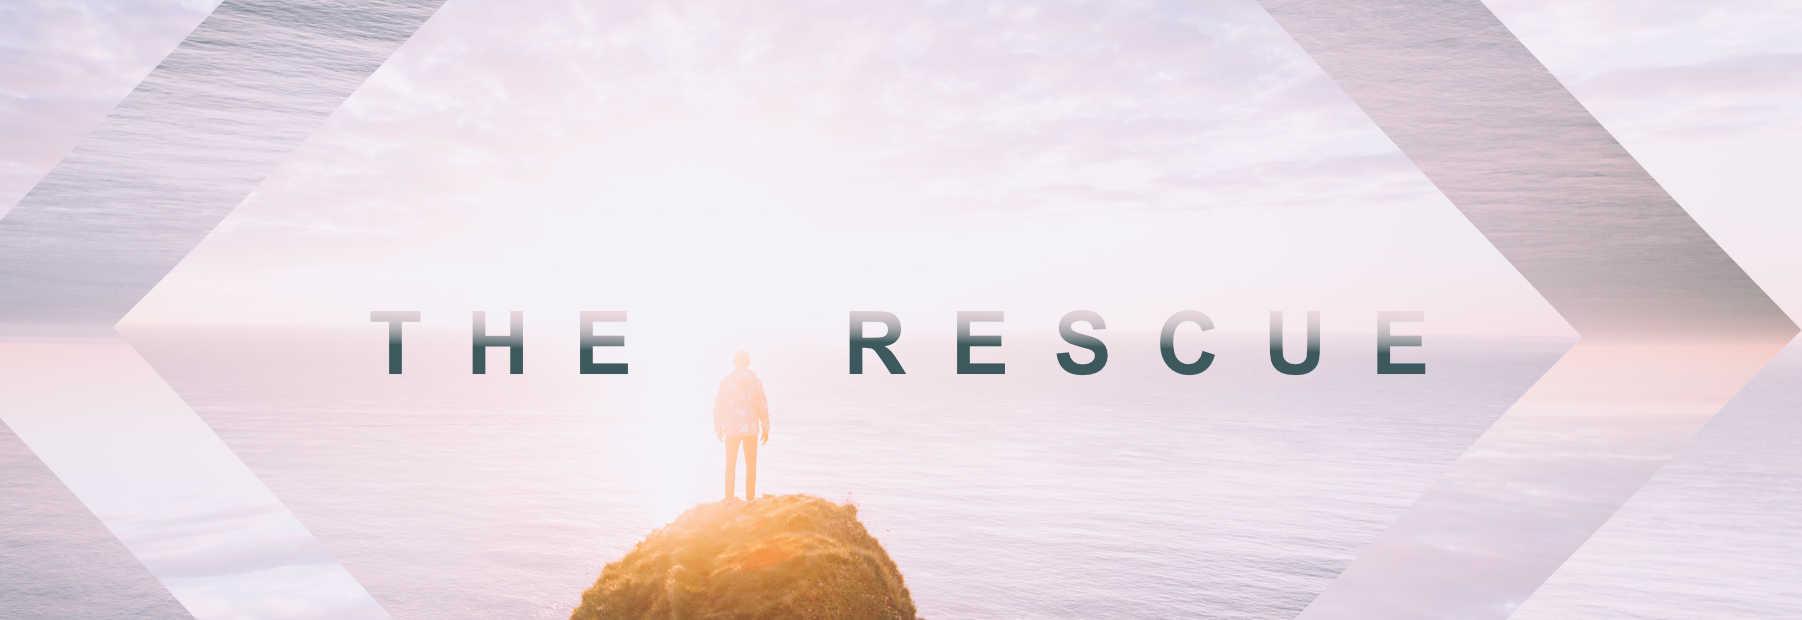 The Rescue webbanner.jpg